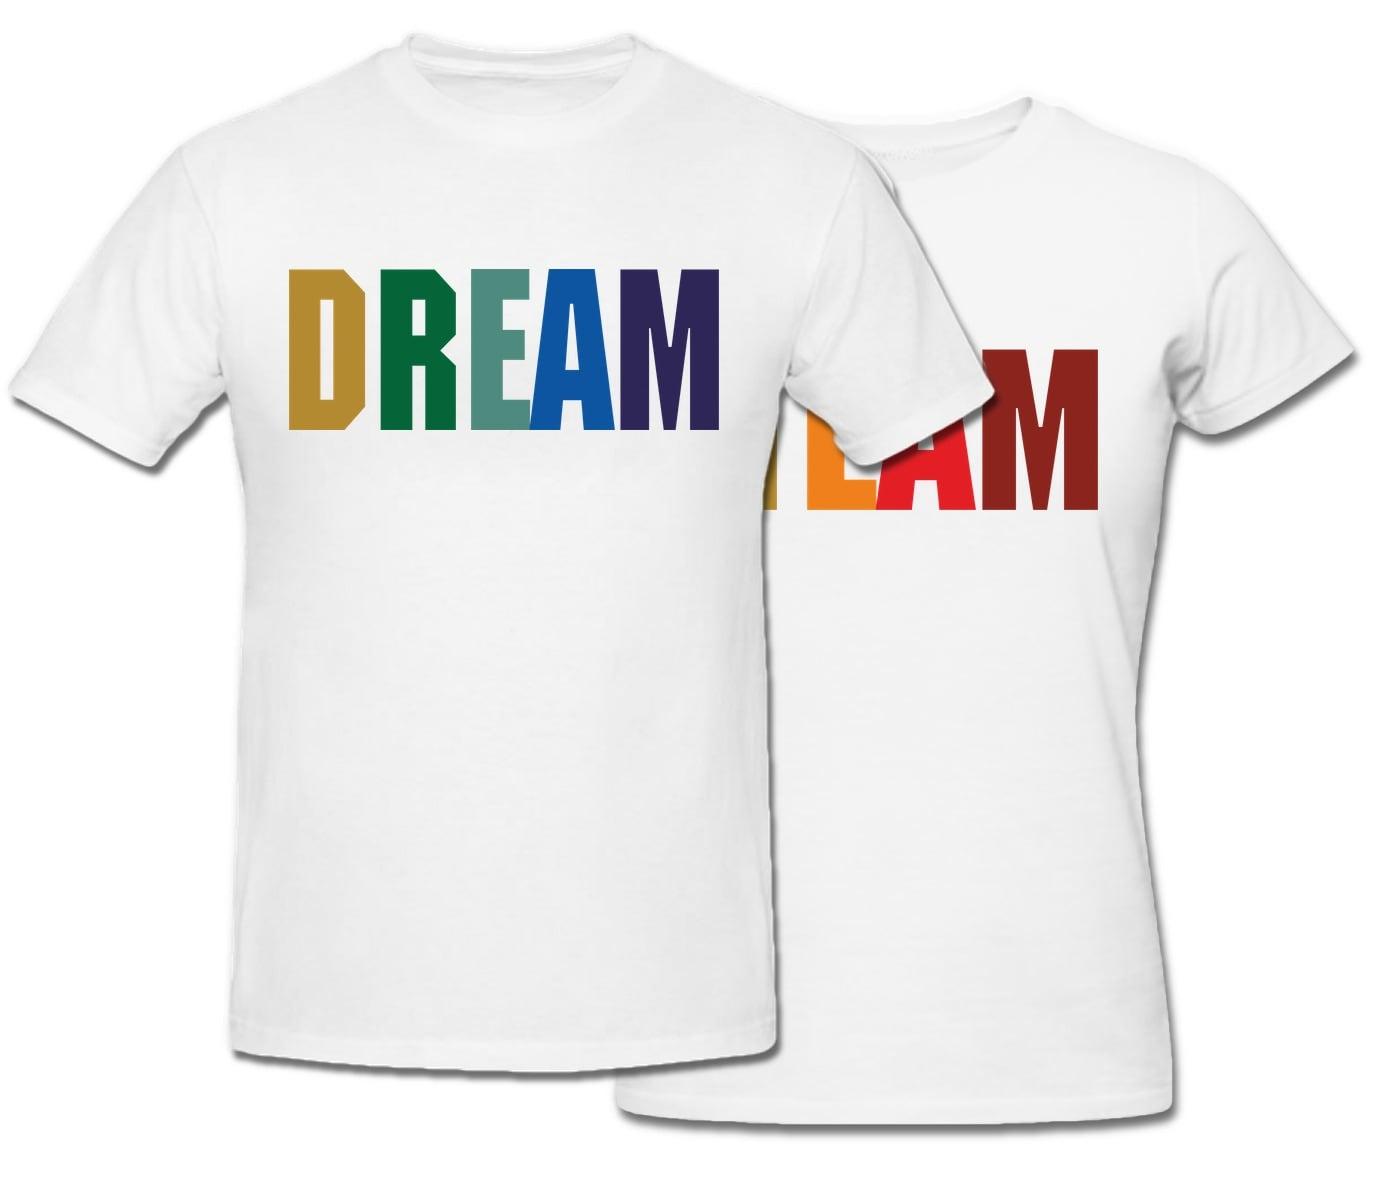 Комплект футболок *Dream Team*